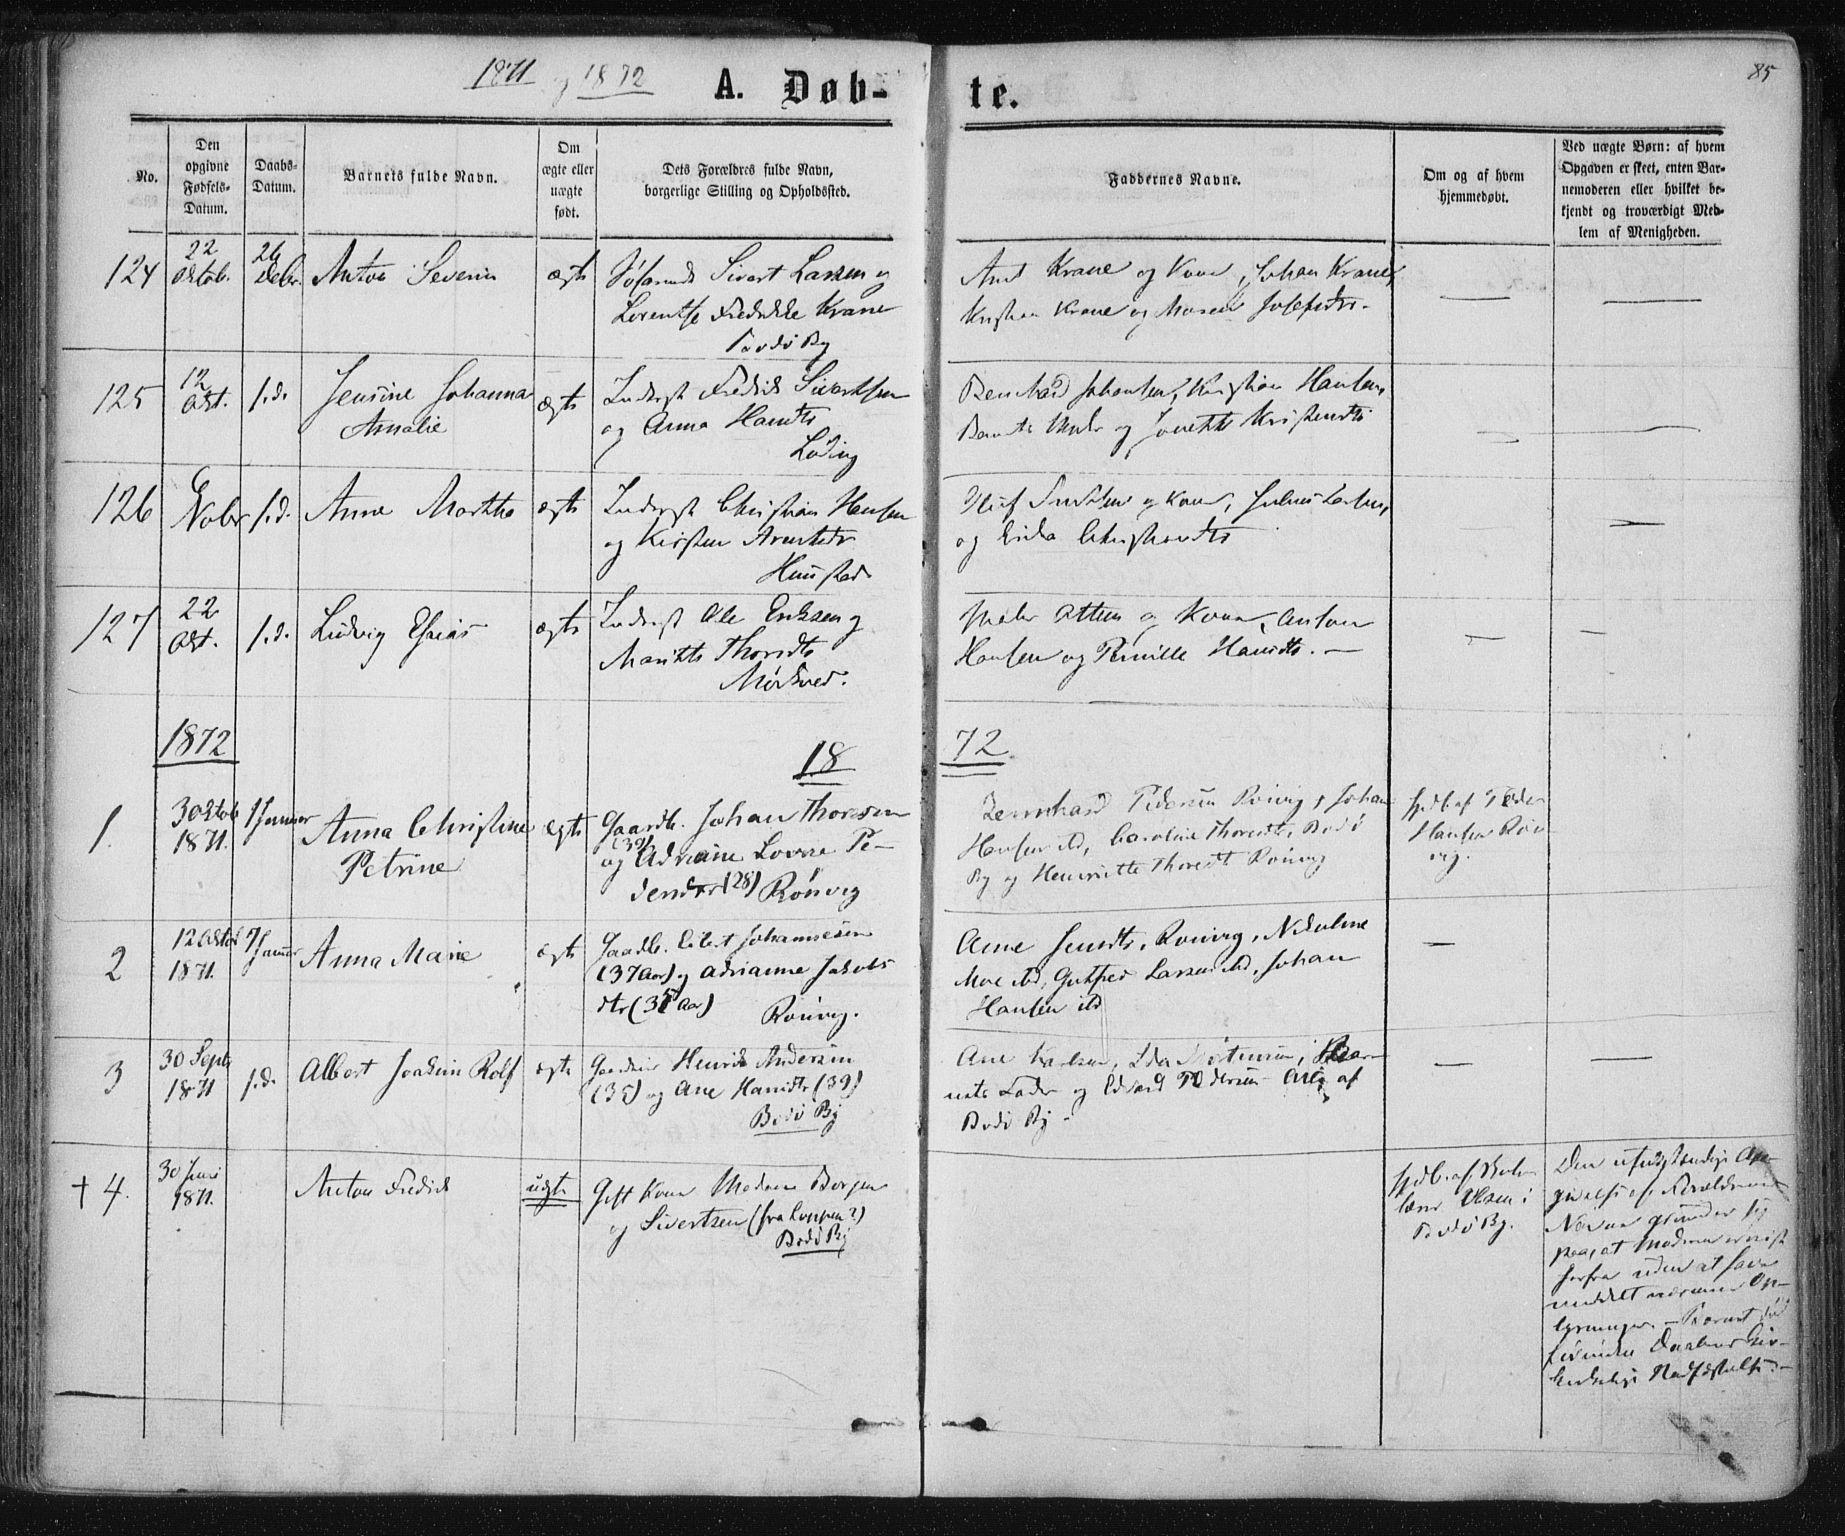 SAT, Ministerialprotokoller, klokkerbøker og fødselsregistre - Nordland, 801/L0008: Ministerialbok nr. 801A08, 1864-1875, s. 85